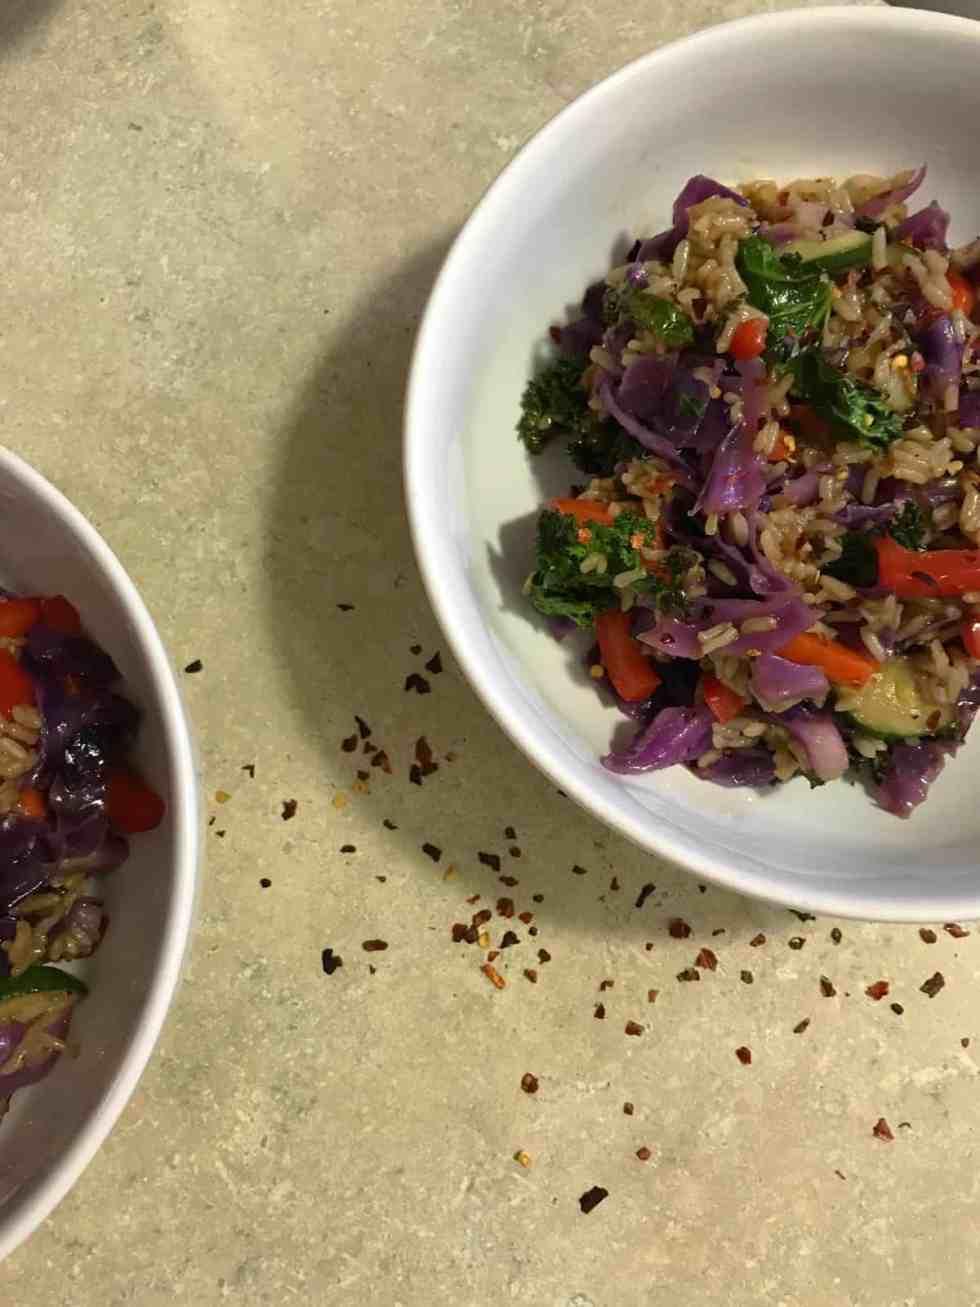 https://www.orchidsandsweettea.com/veggie-brown-rice-stir-fry/